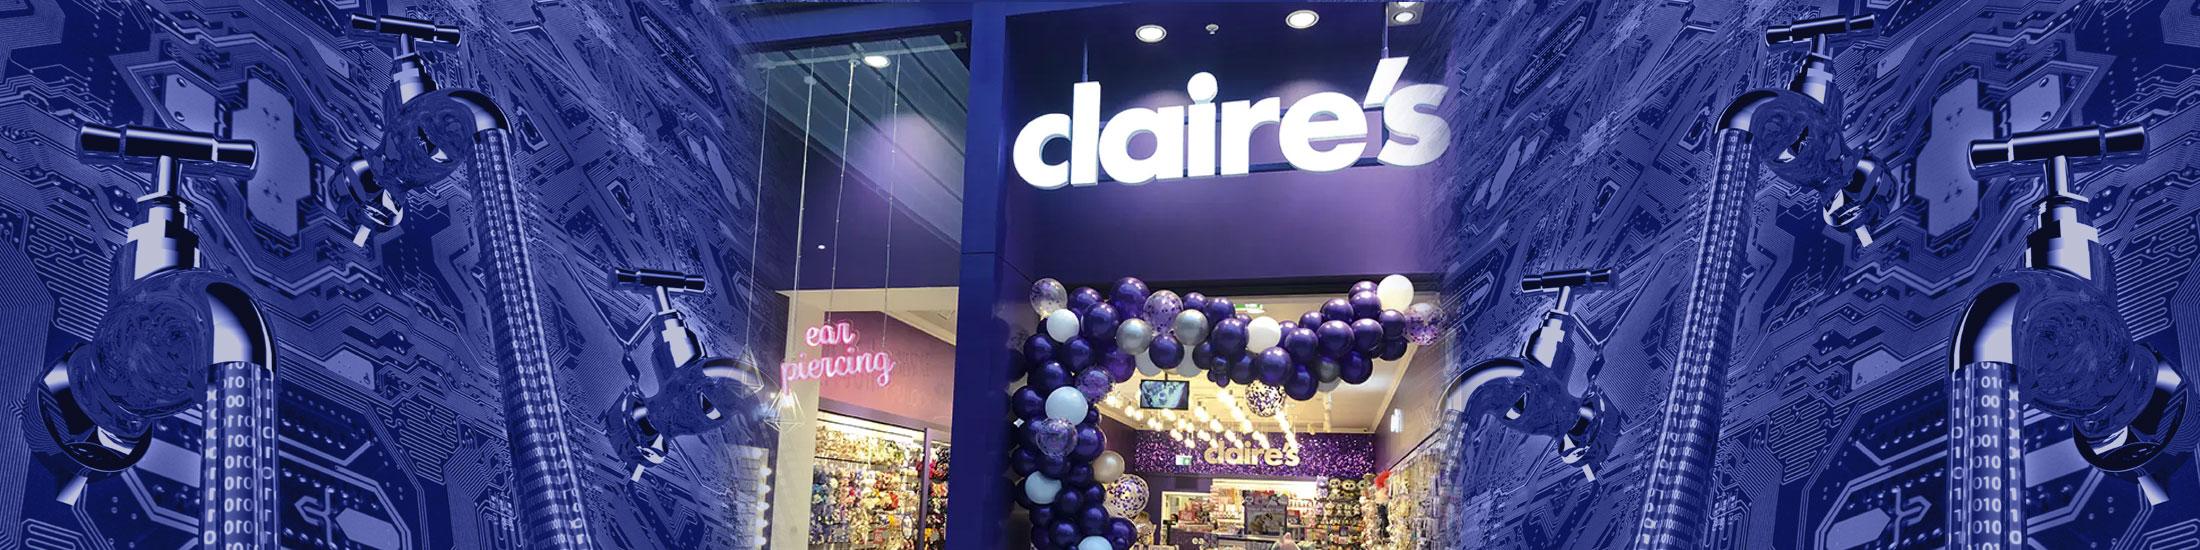 Accessories Retailer Claire's Falls Victim to Magecart Attack